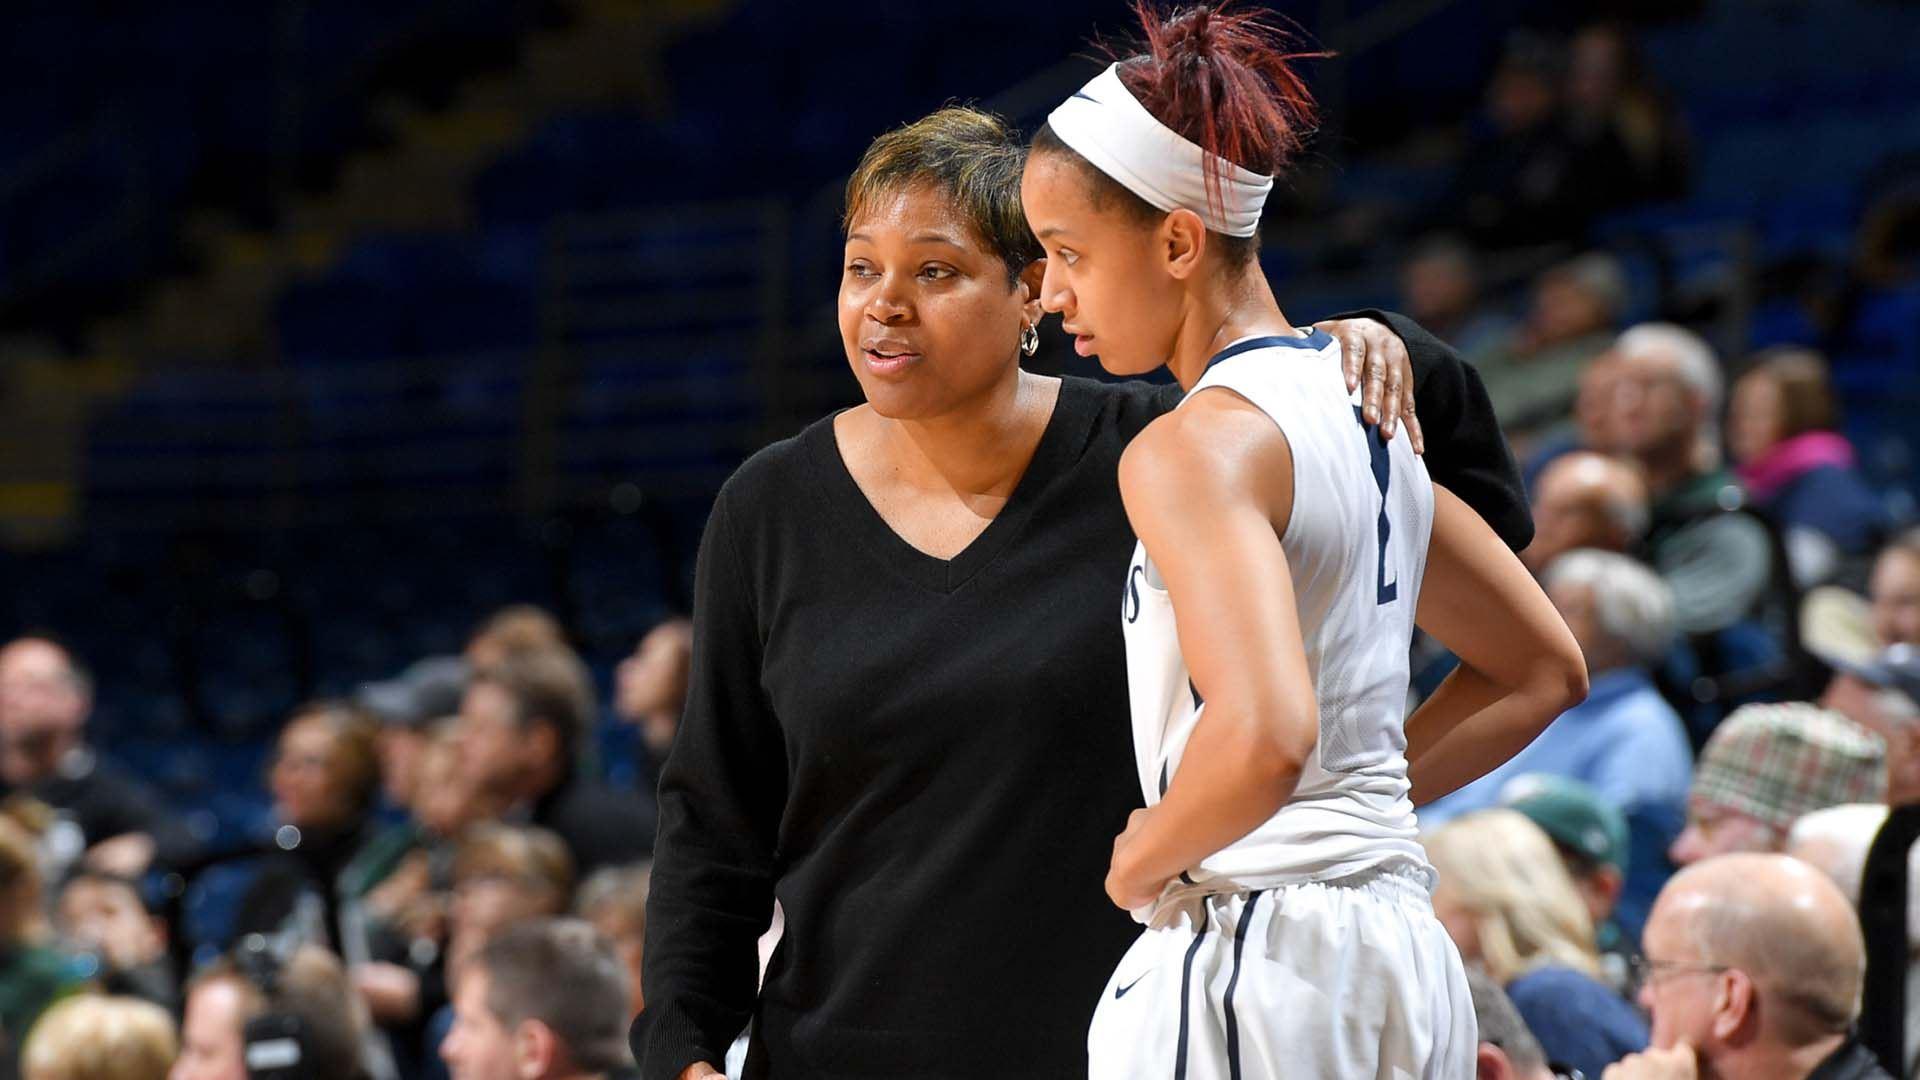 boro womens basketball coach - HD1070×1078